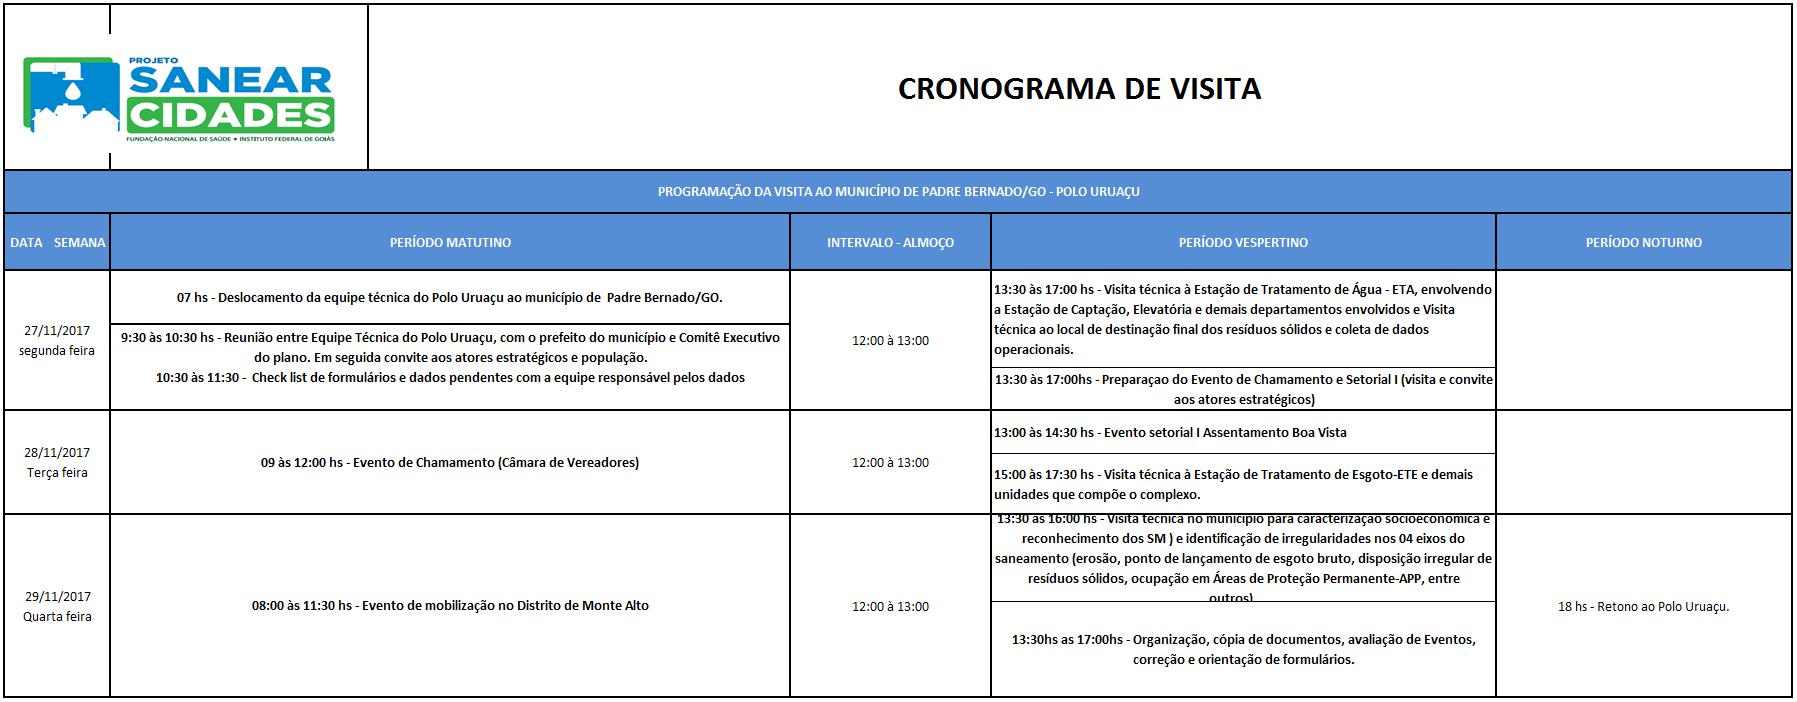 Cronograma-de-Visita-Padre-Bernardo